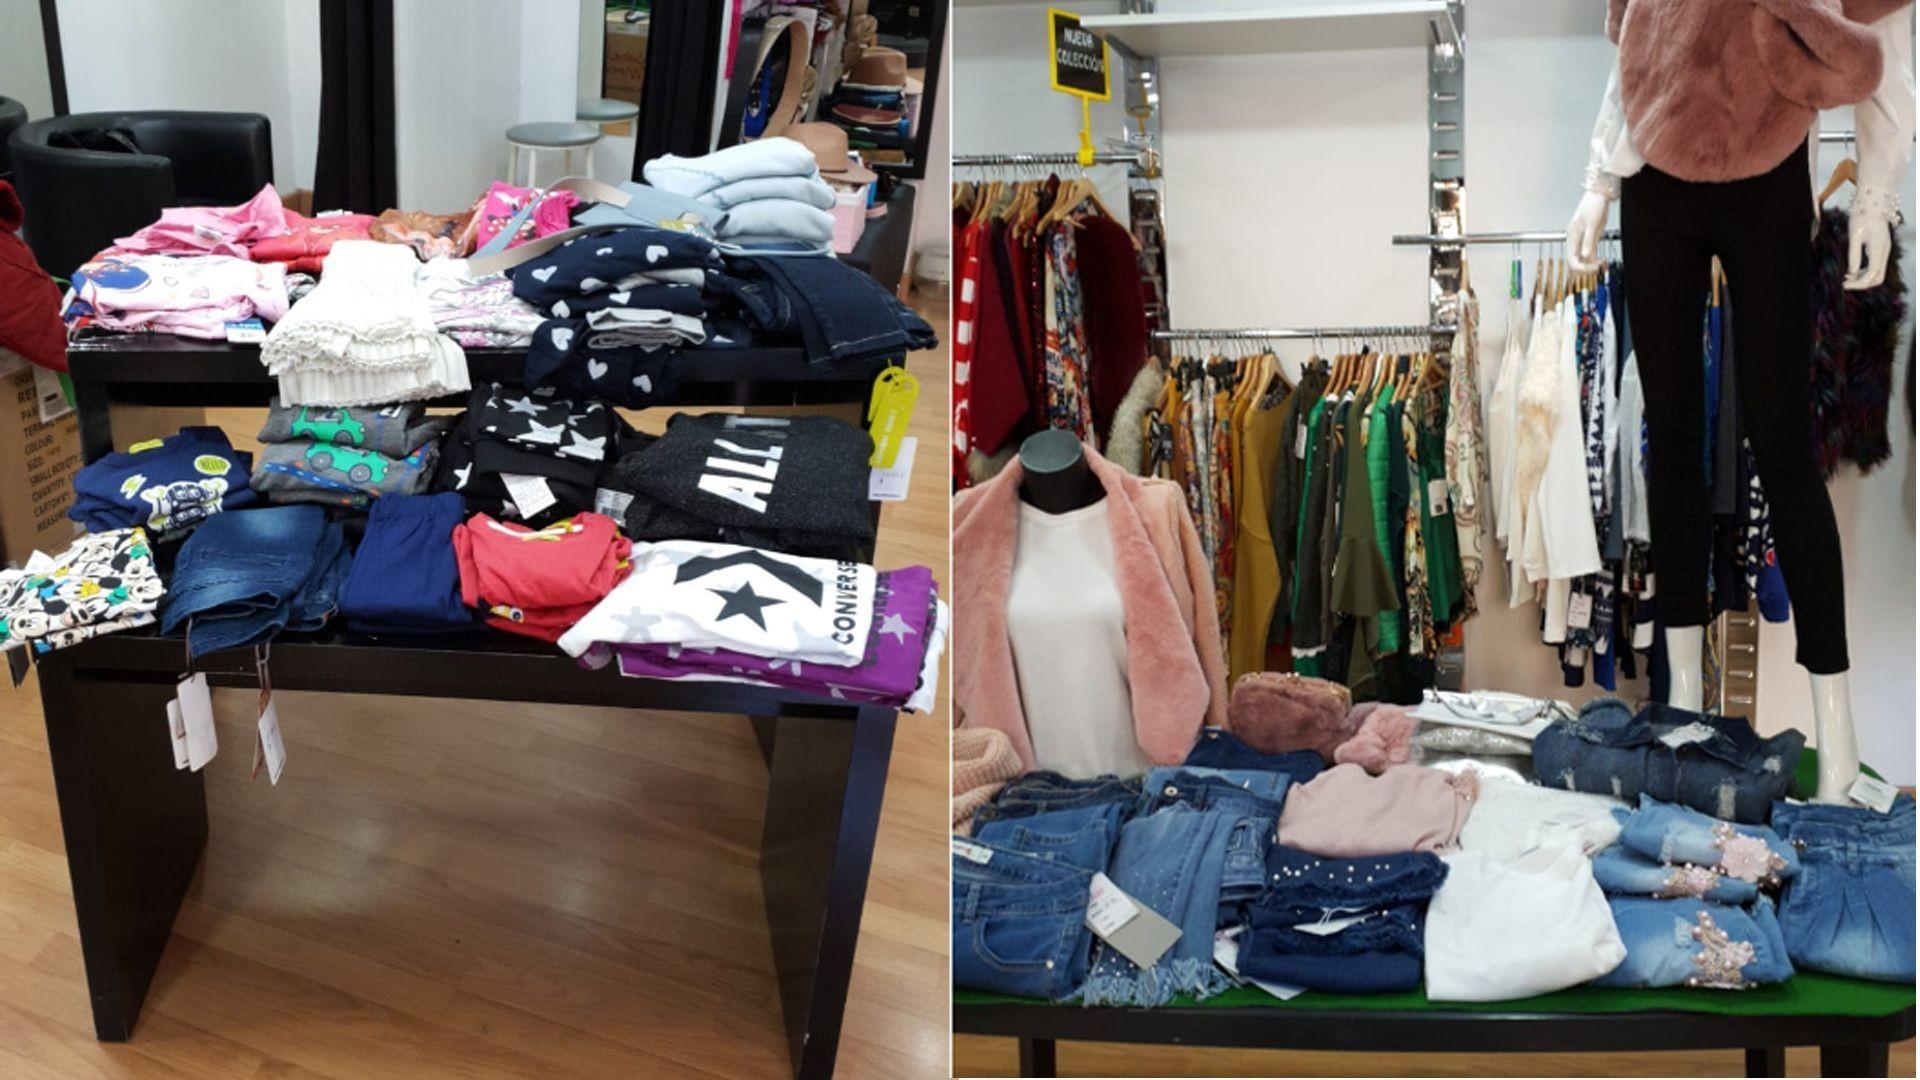 Tienda de ropa enn Alicante